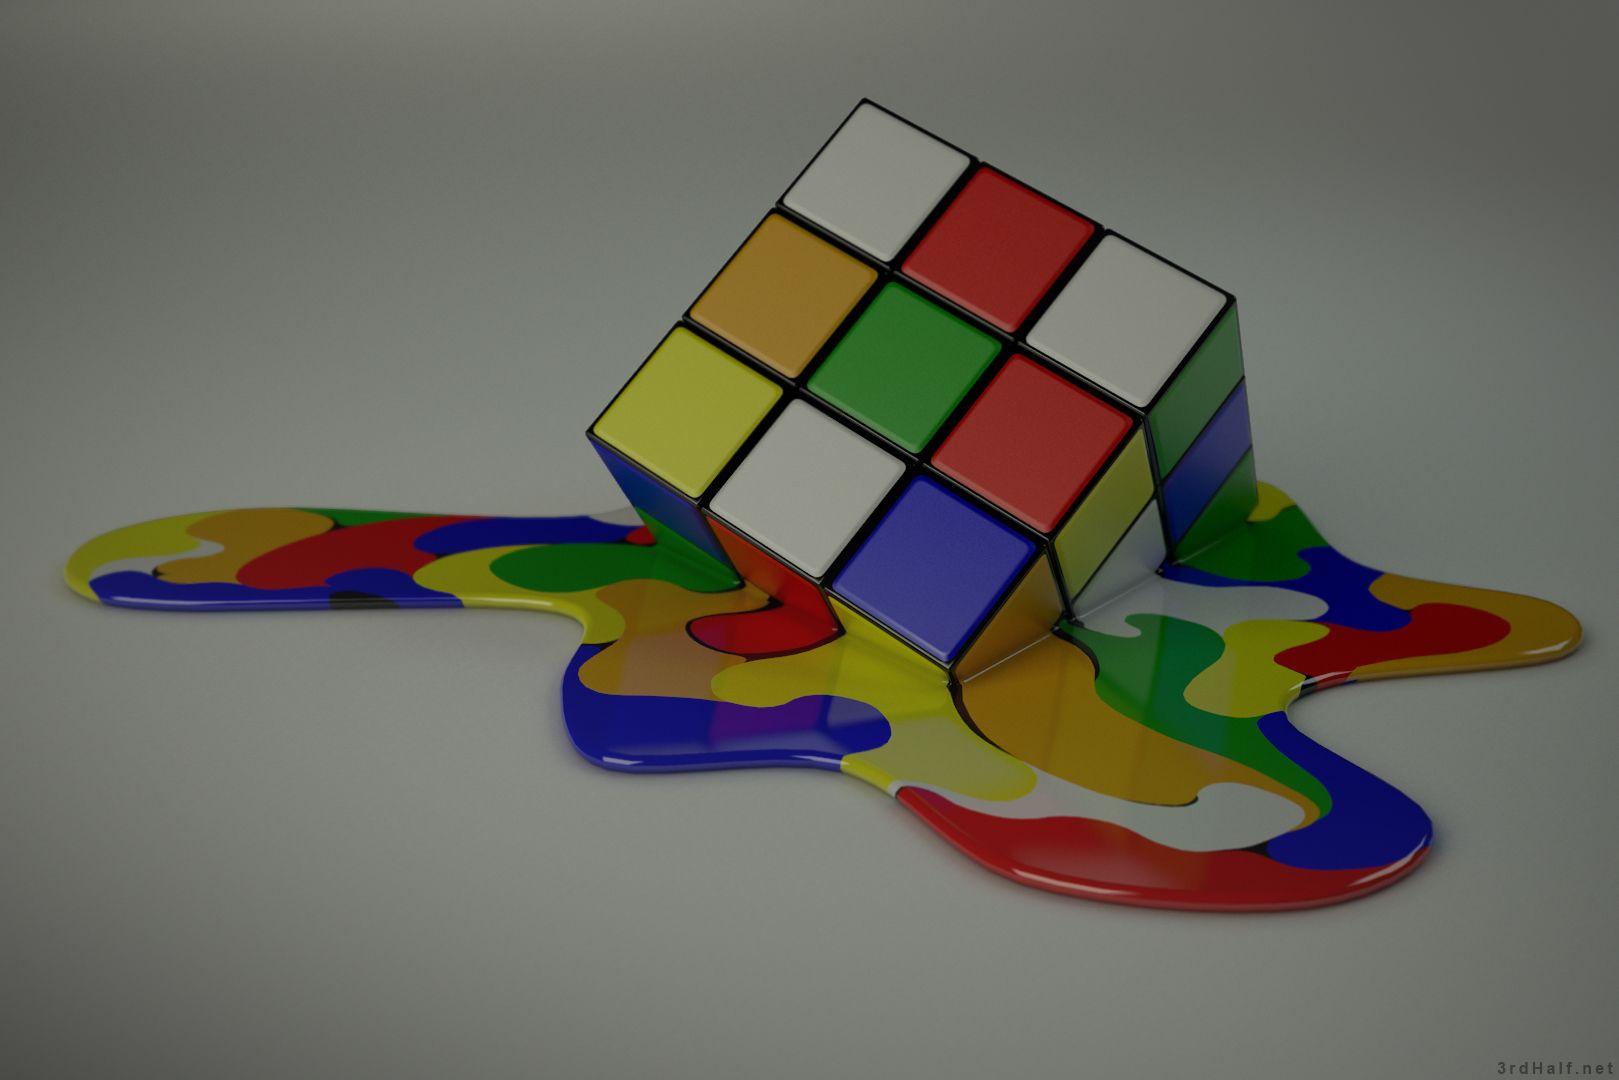 rubik's cube wallpaper hd for desktop background | iphone | ipad